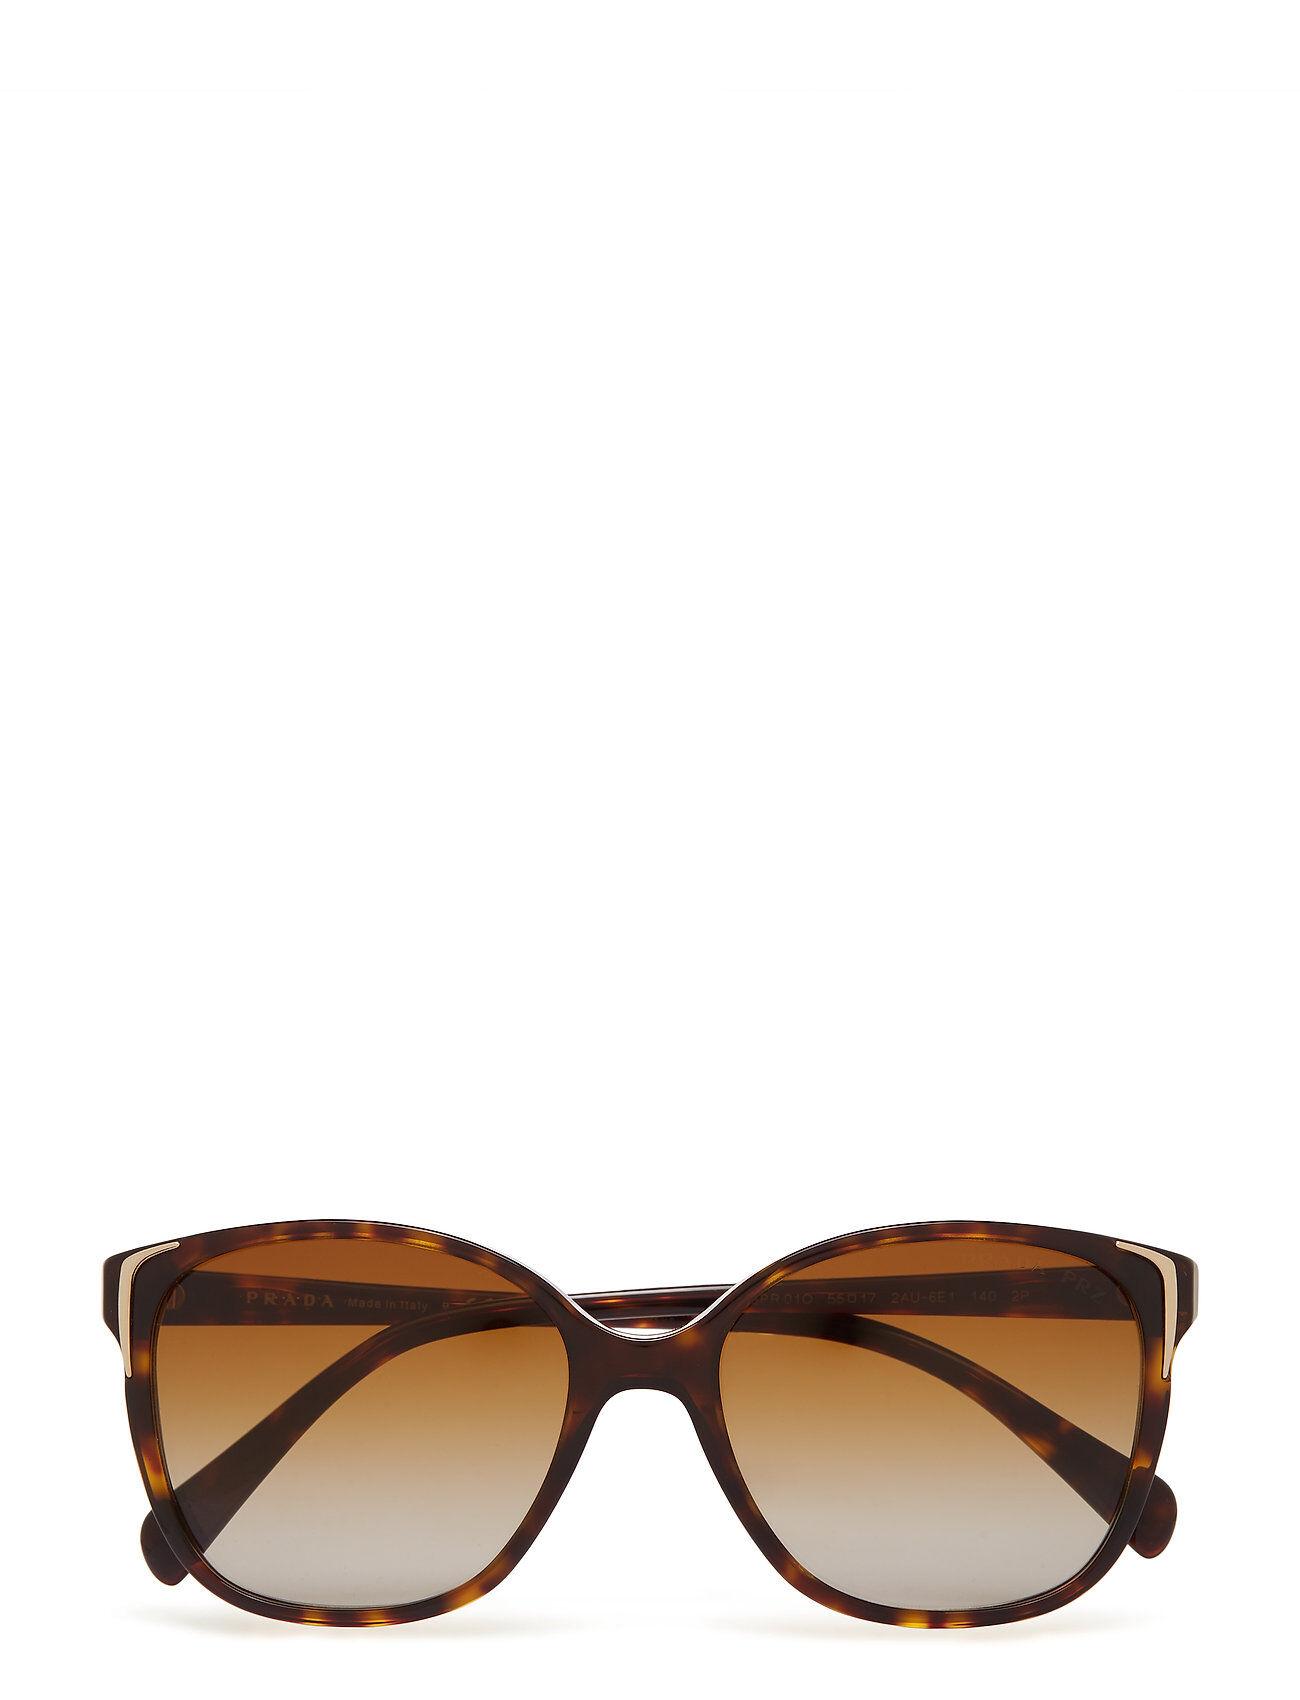 Image of Prada Sunglasses 0pr 01os Wayfarer Aurinkolasit Ruskea Prada Sunglasses